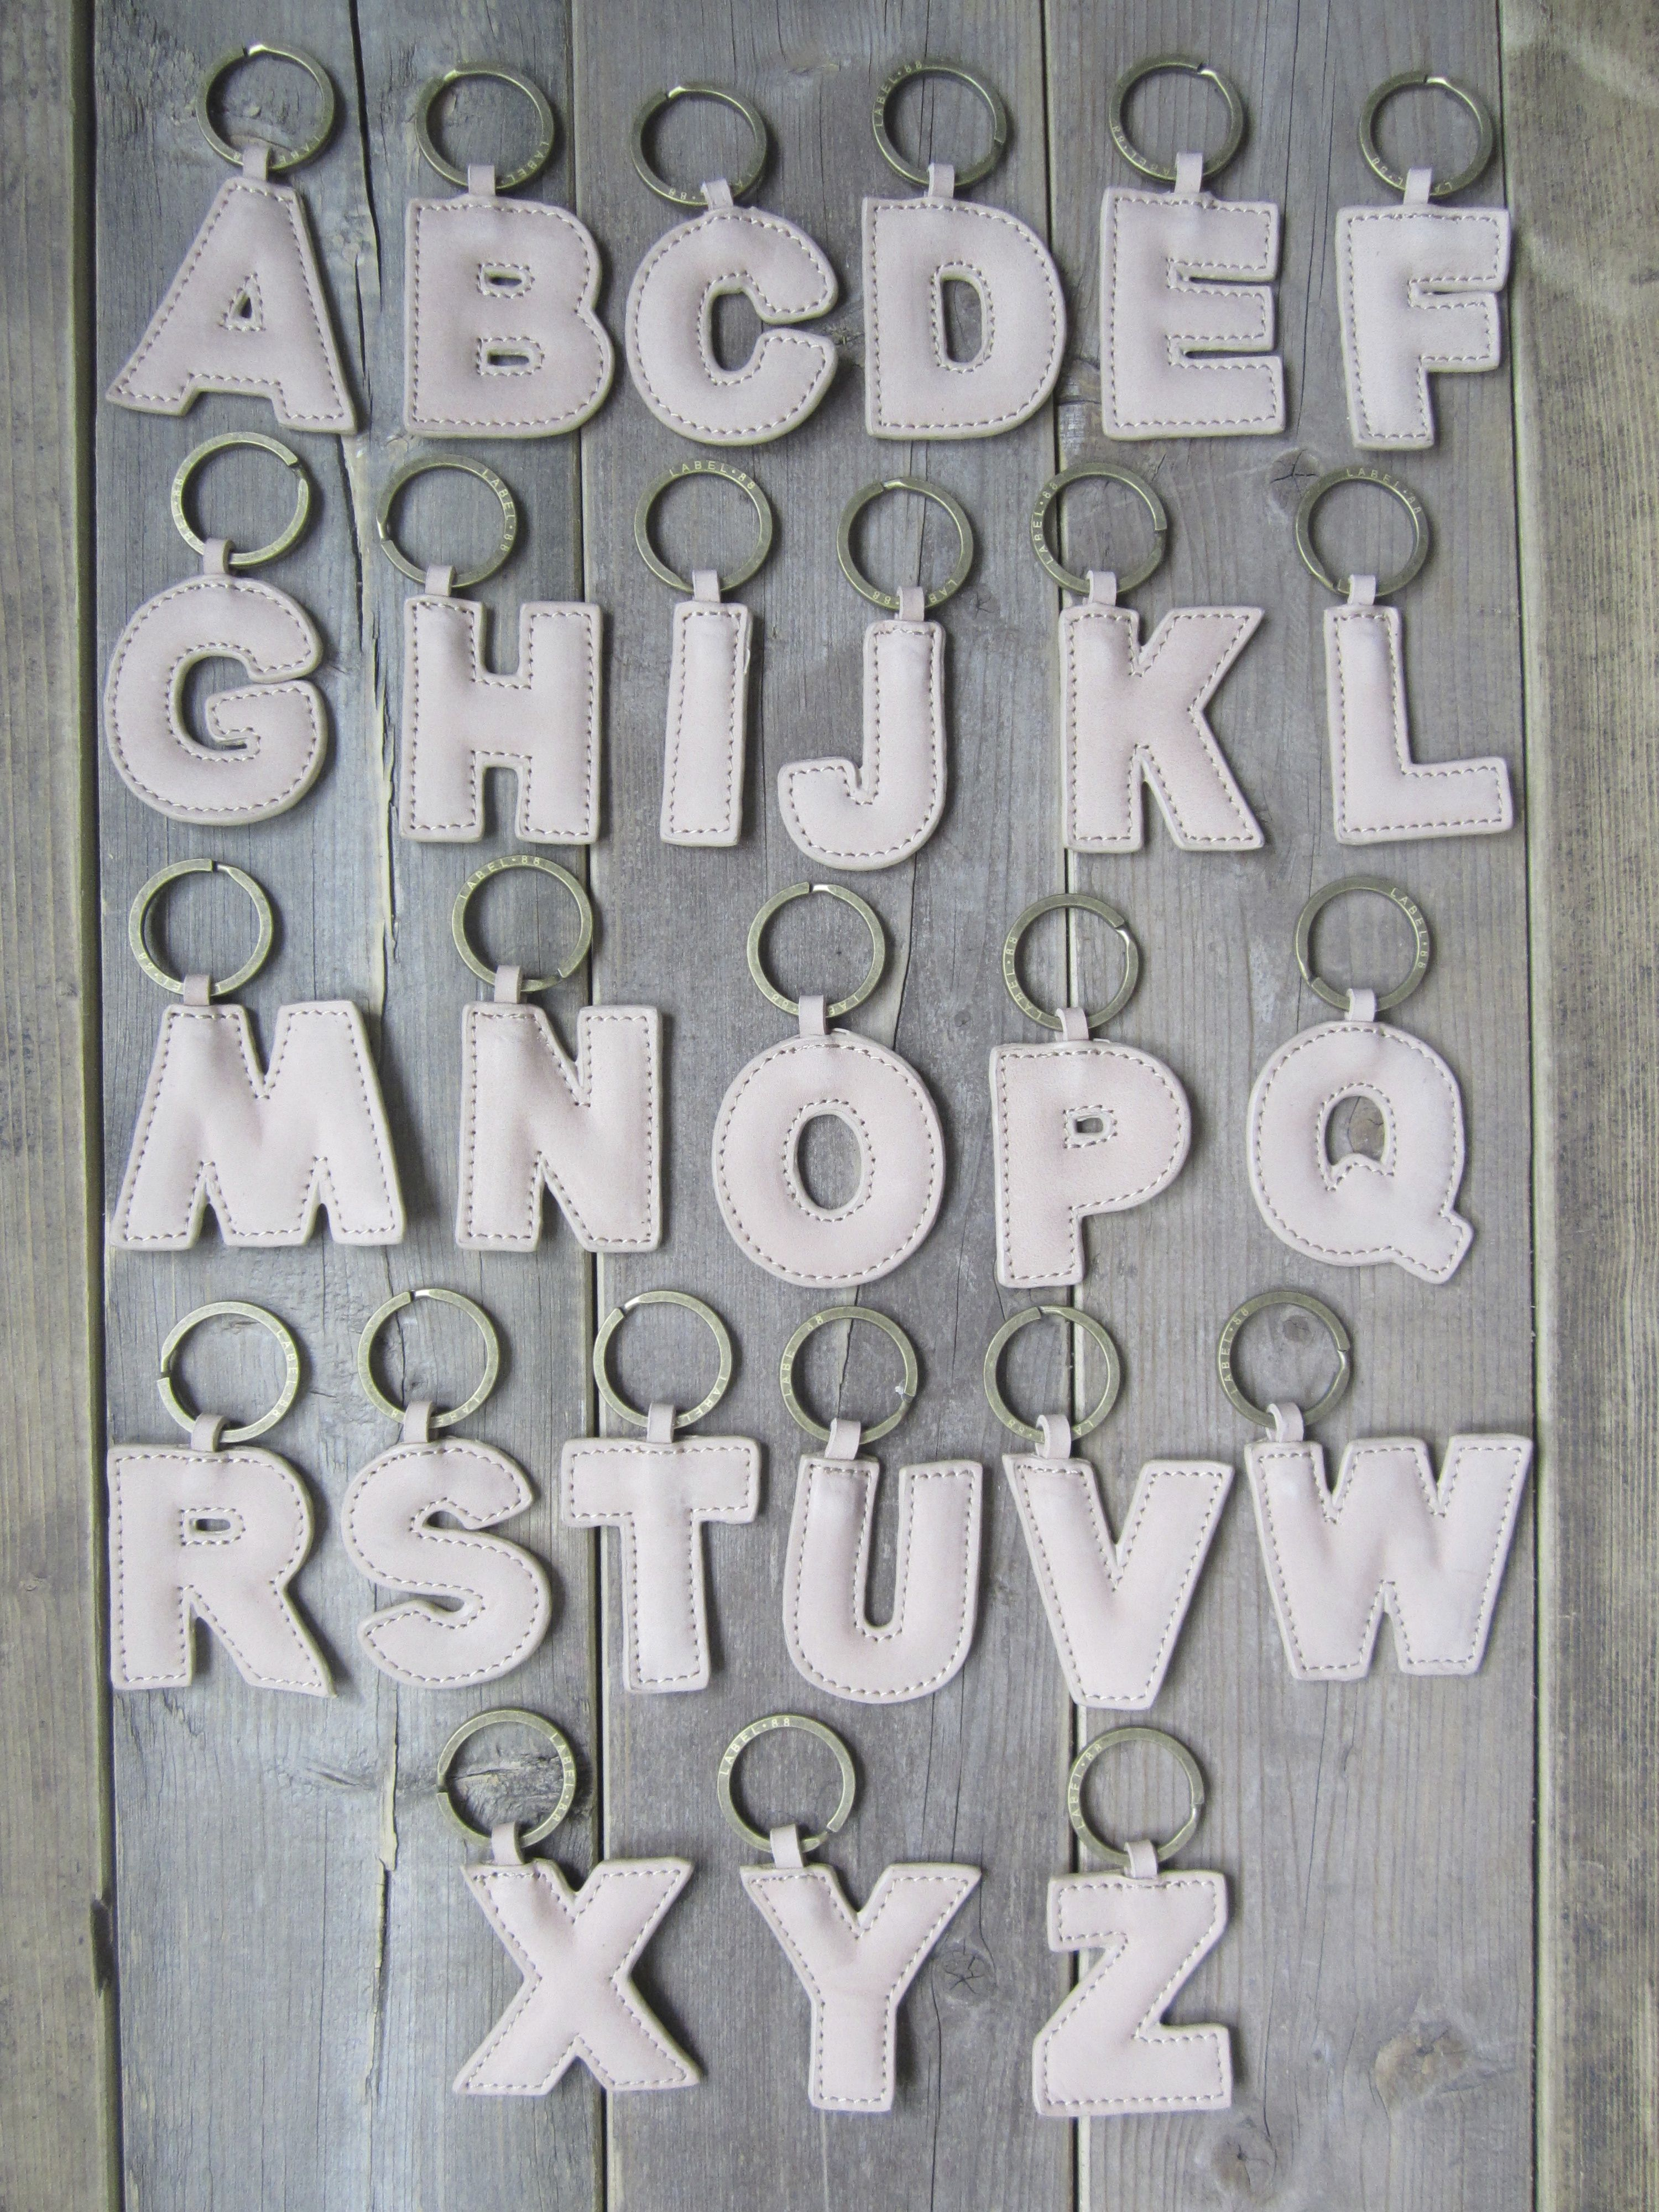 Label 88; A, B, C, Keyring